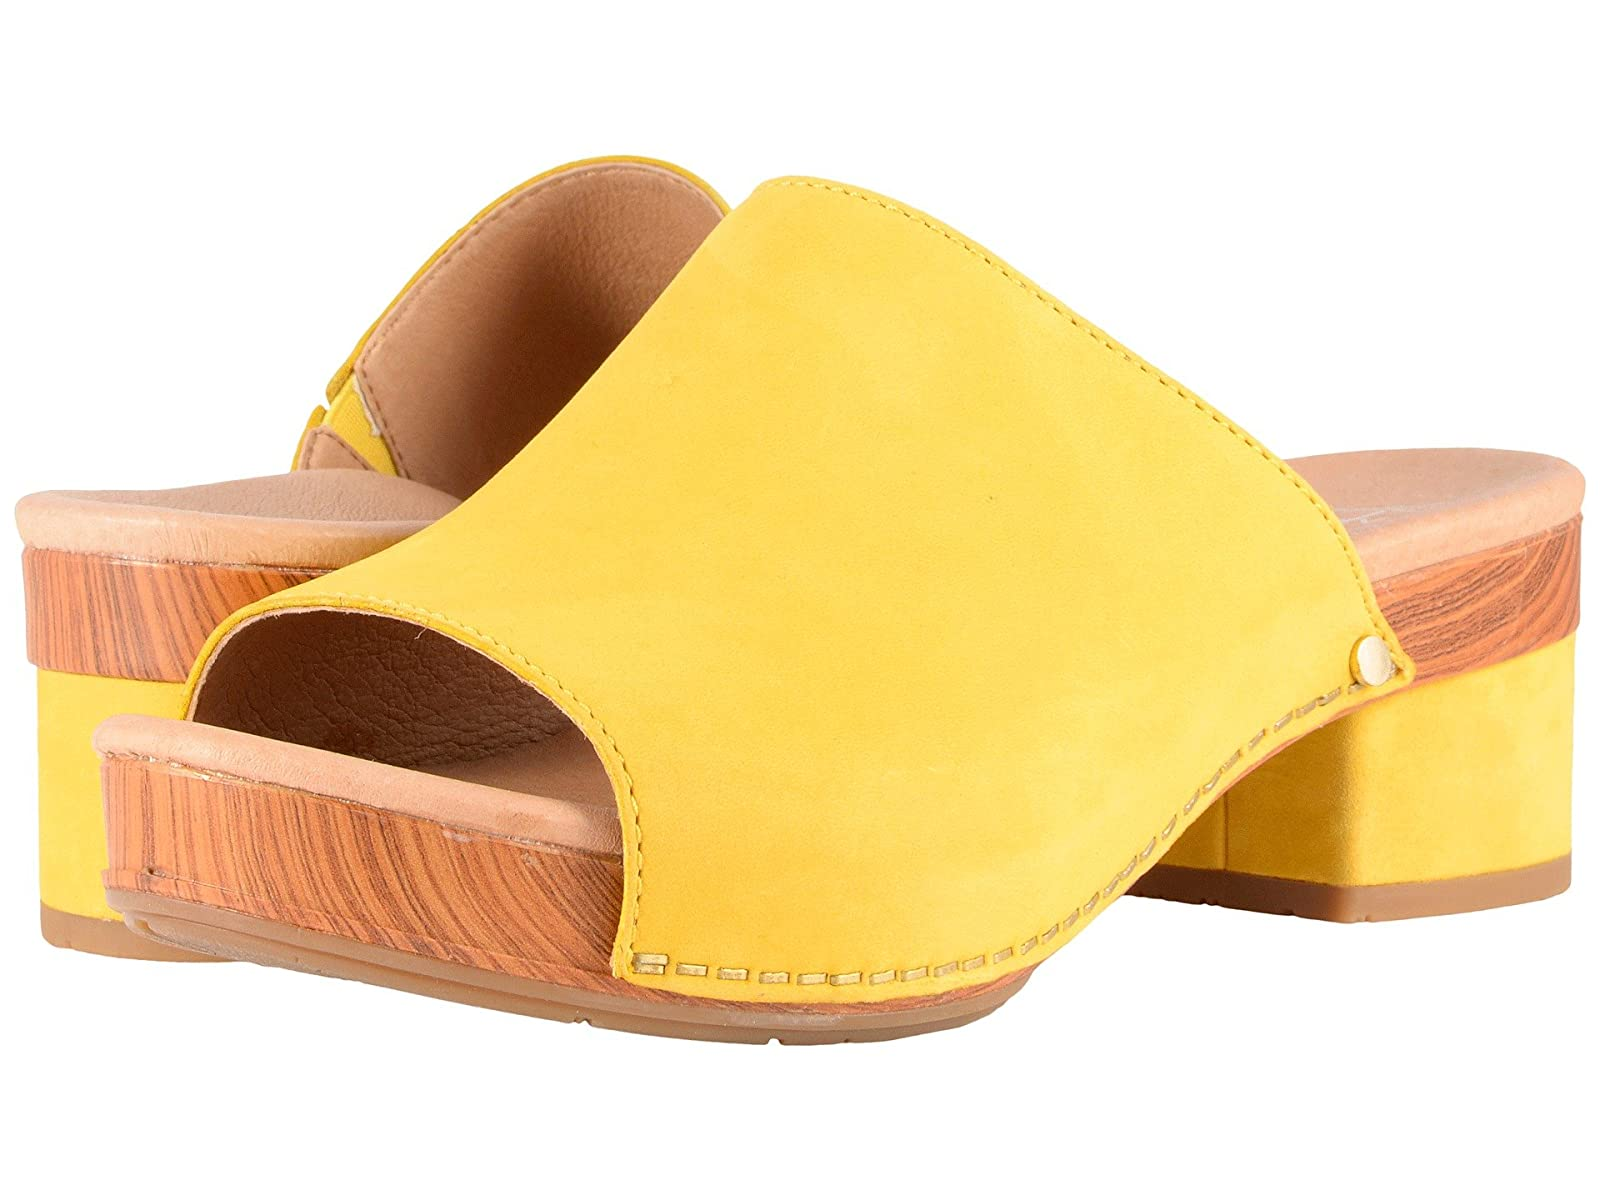 Dansko MaciAtmospheric grades have affordable shoes